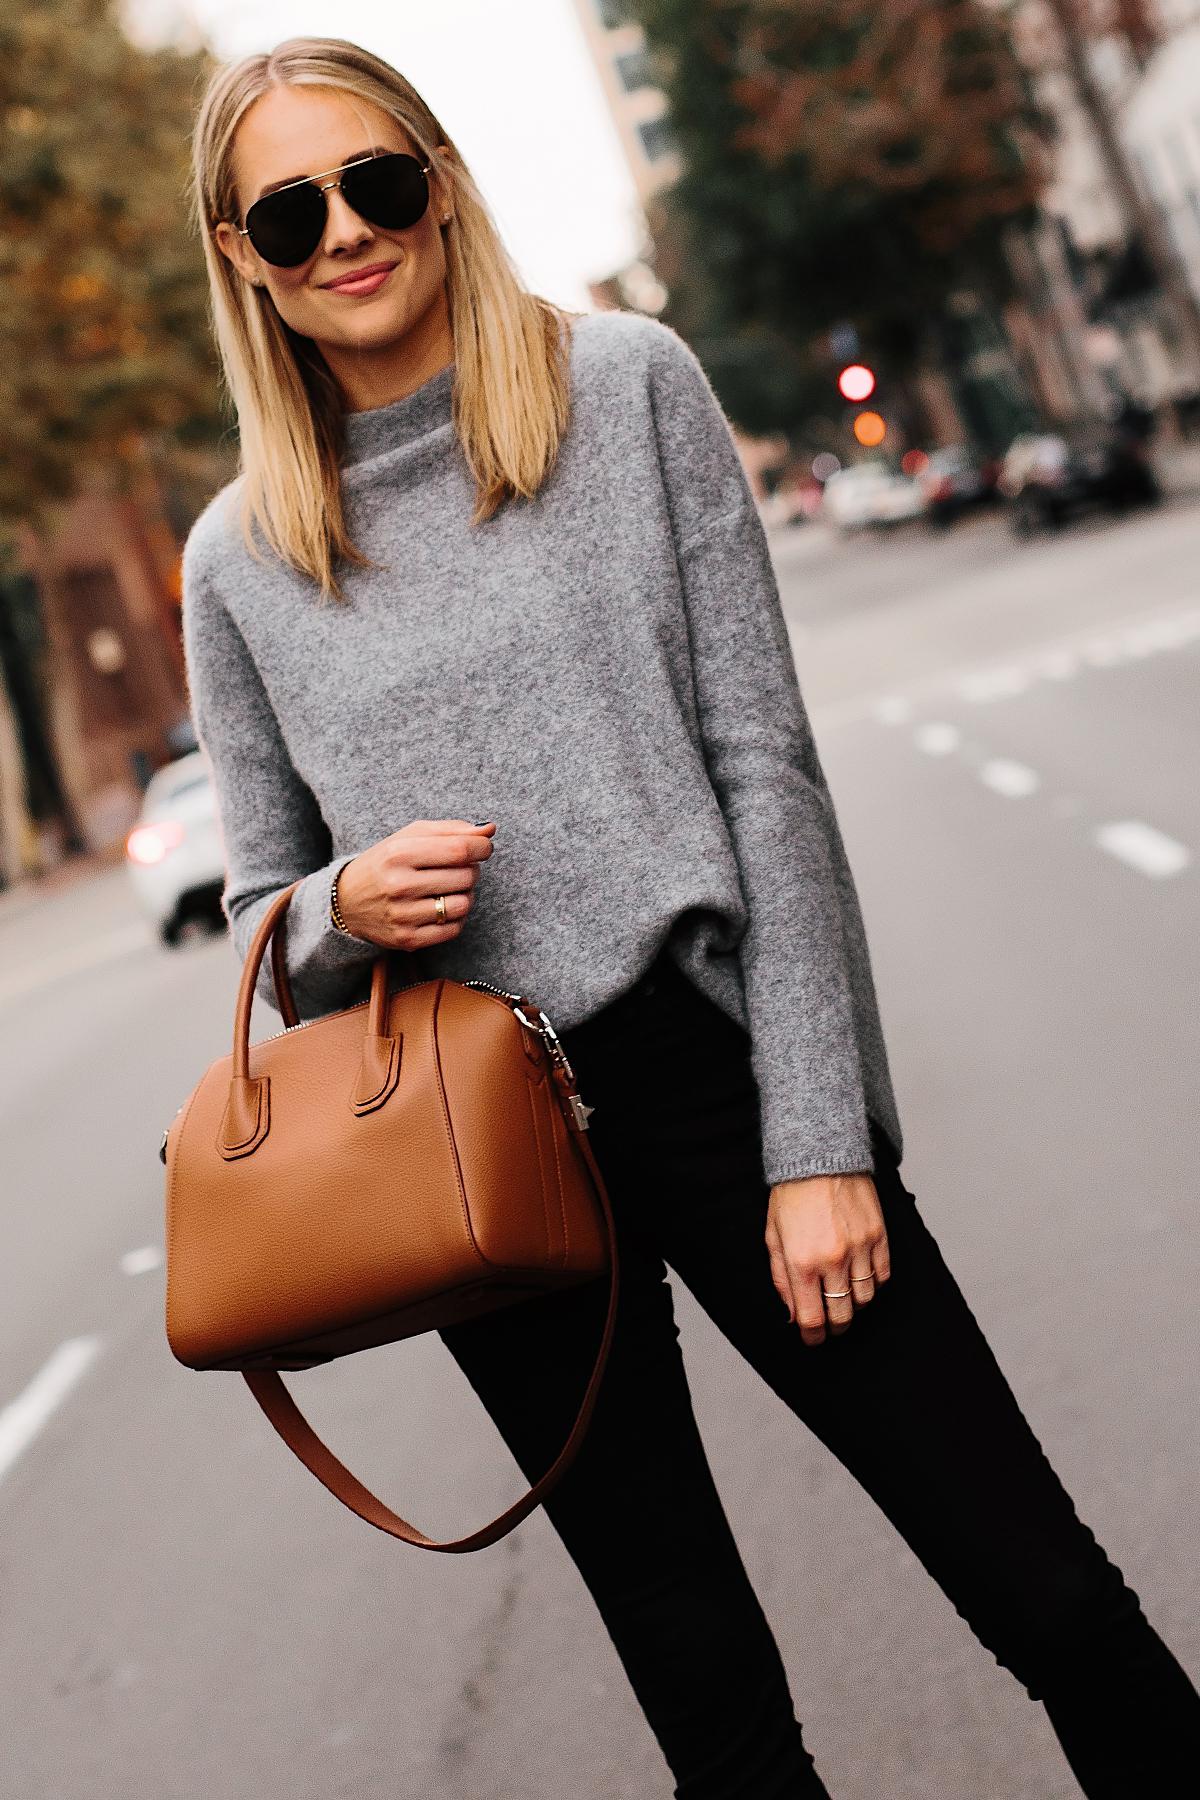 Fashion Jackson Bloomingdales Grey Cashmere Mock Neck Sweater Black Skinny Jeans Tan Satchel Handbag Aviator Sunglasses